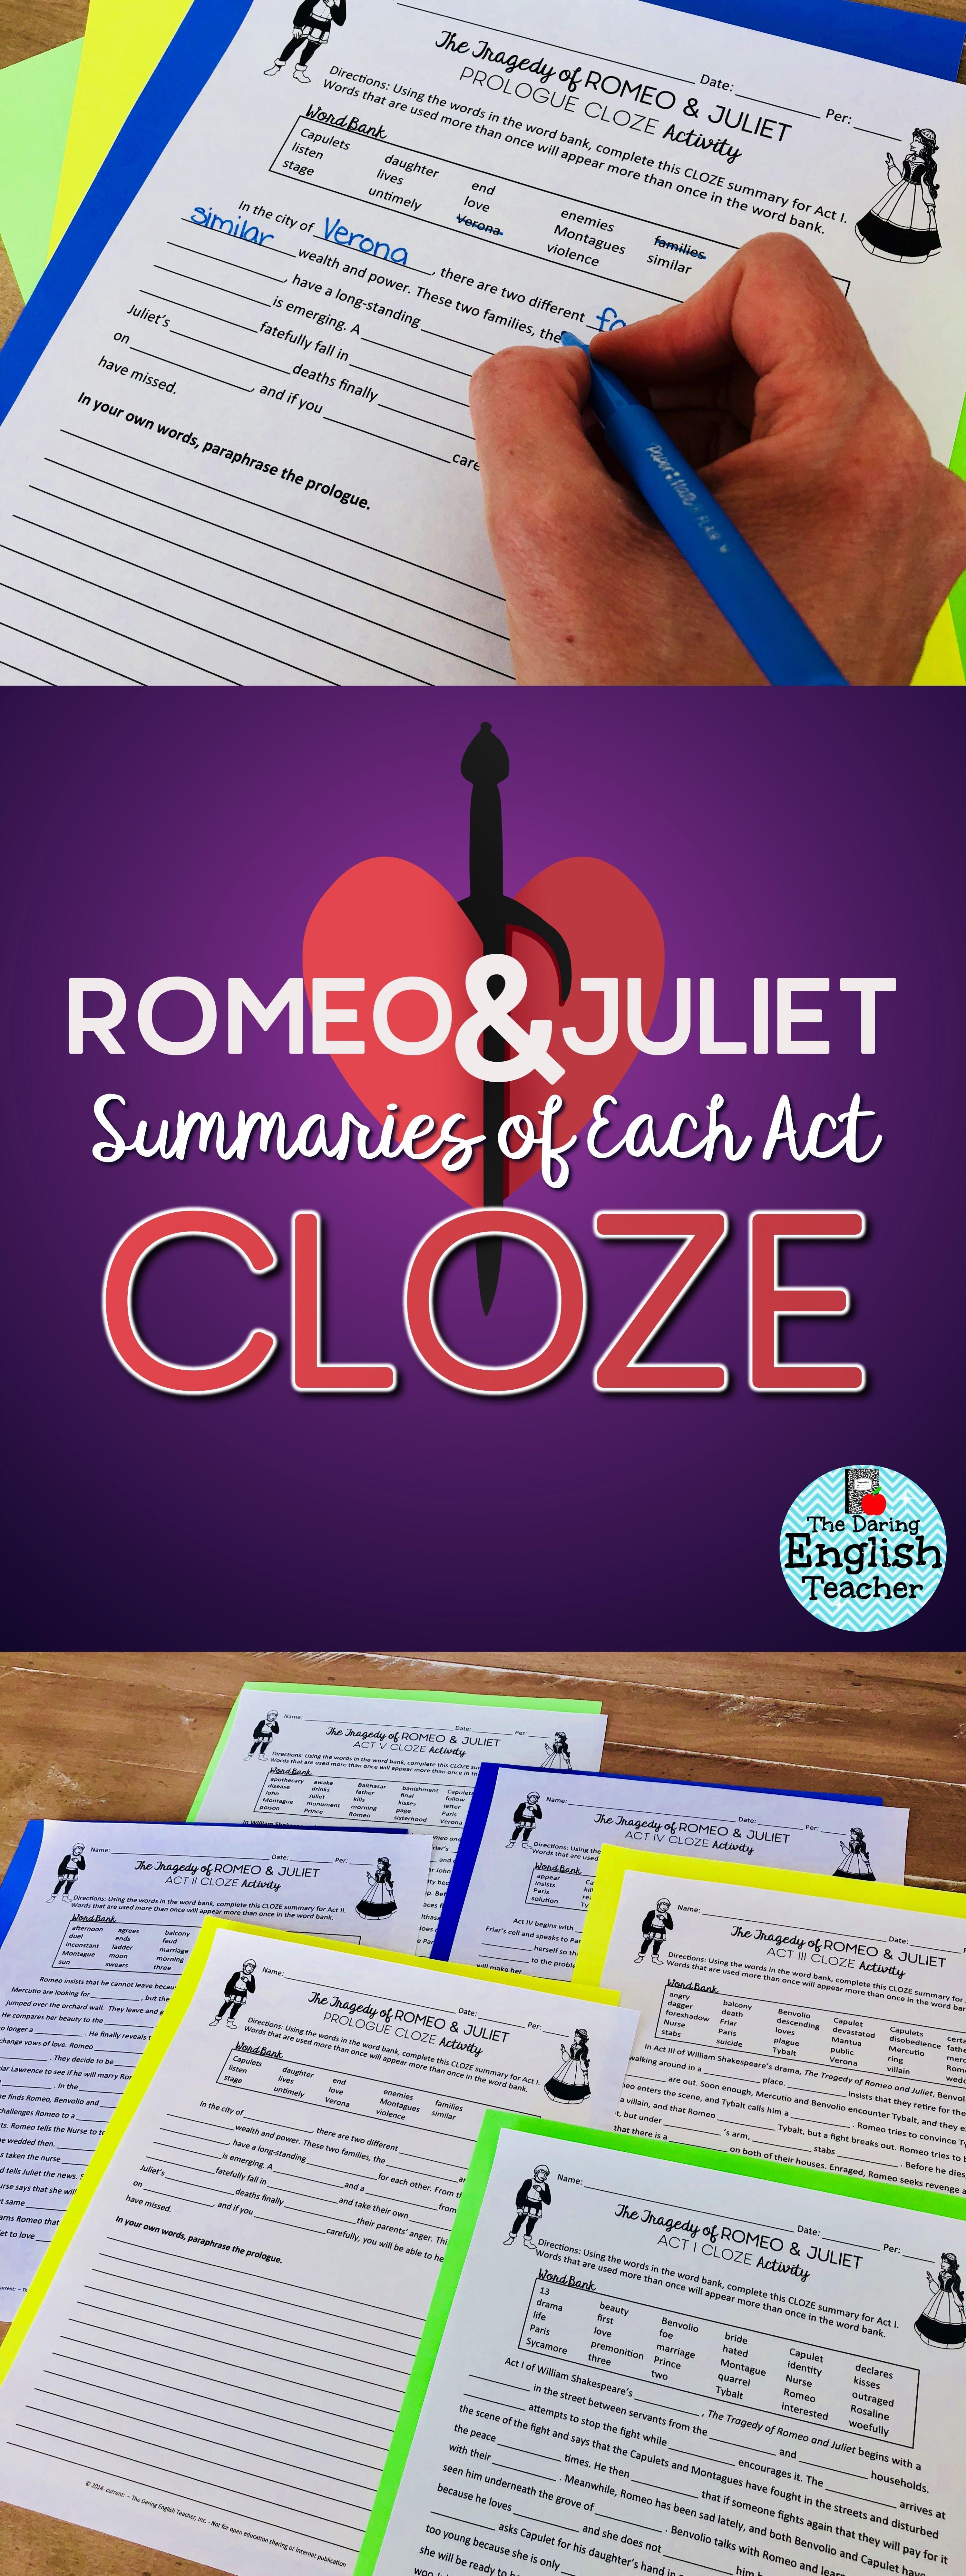 Romeo And Juliet Cloze Summary Passage English Teacher High School Teaching Shakespeare In Text Citation Paraphrase